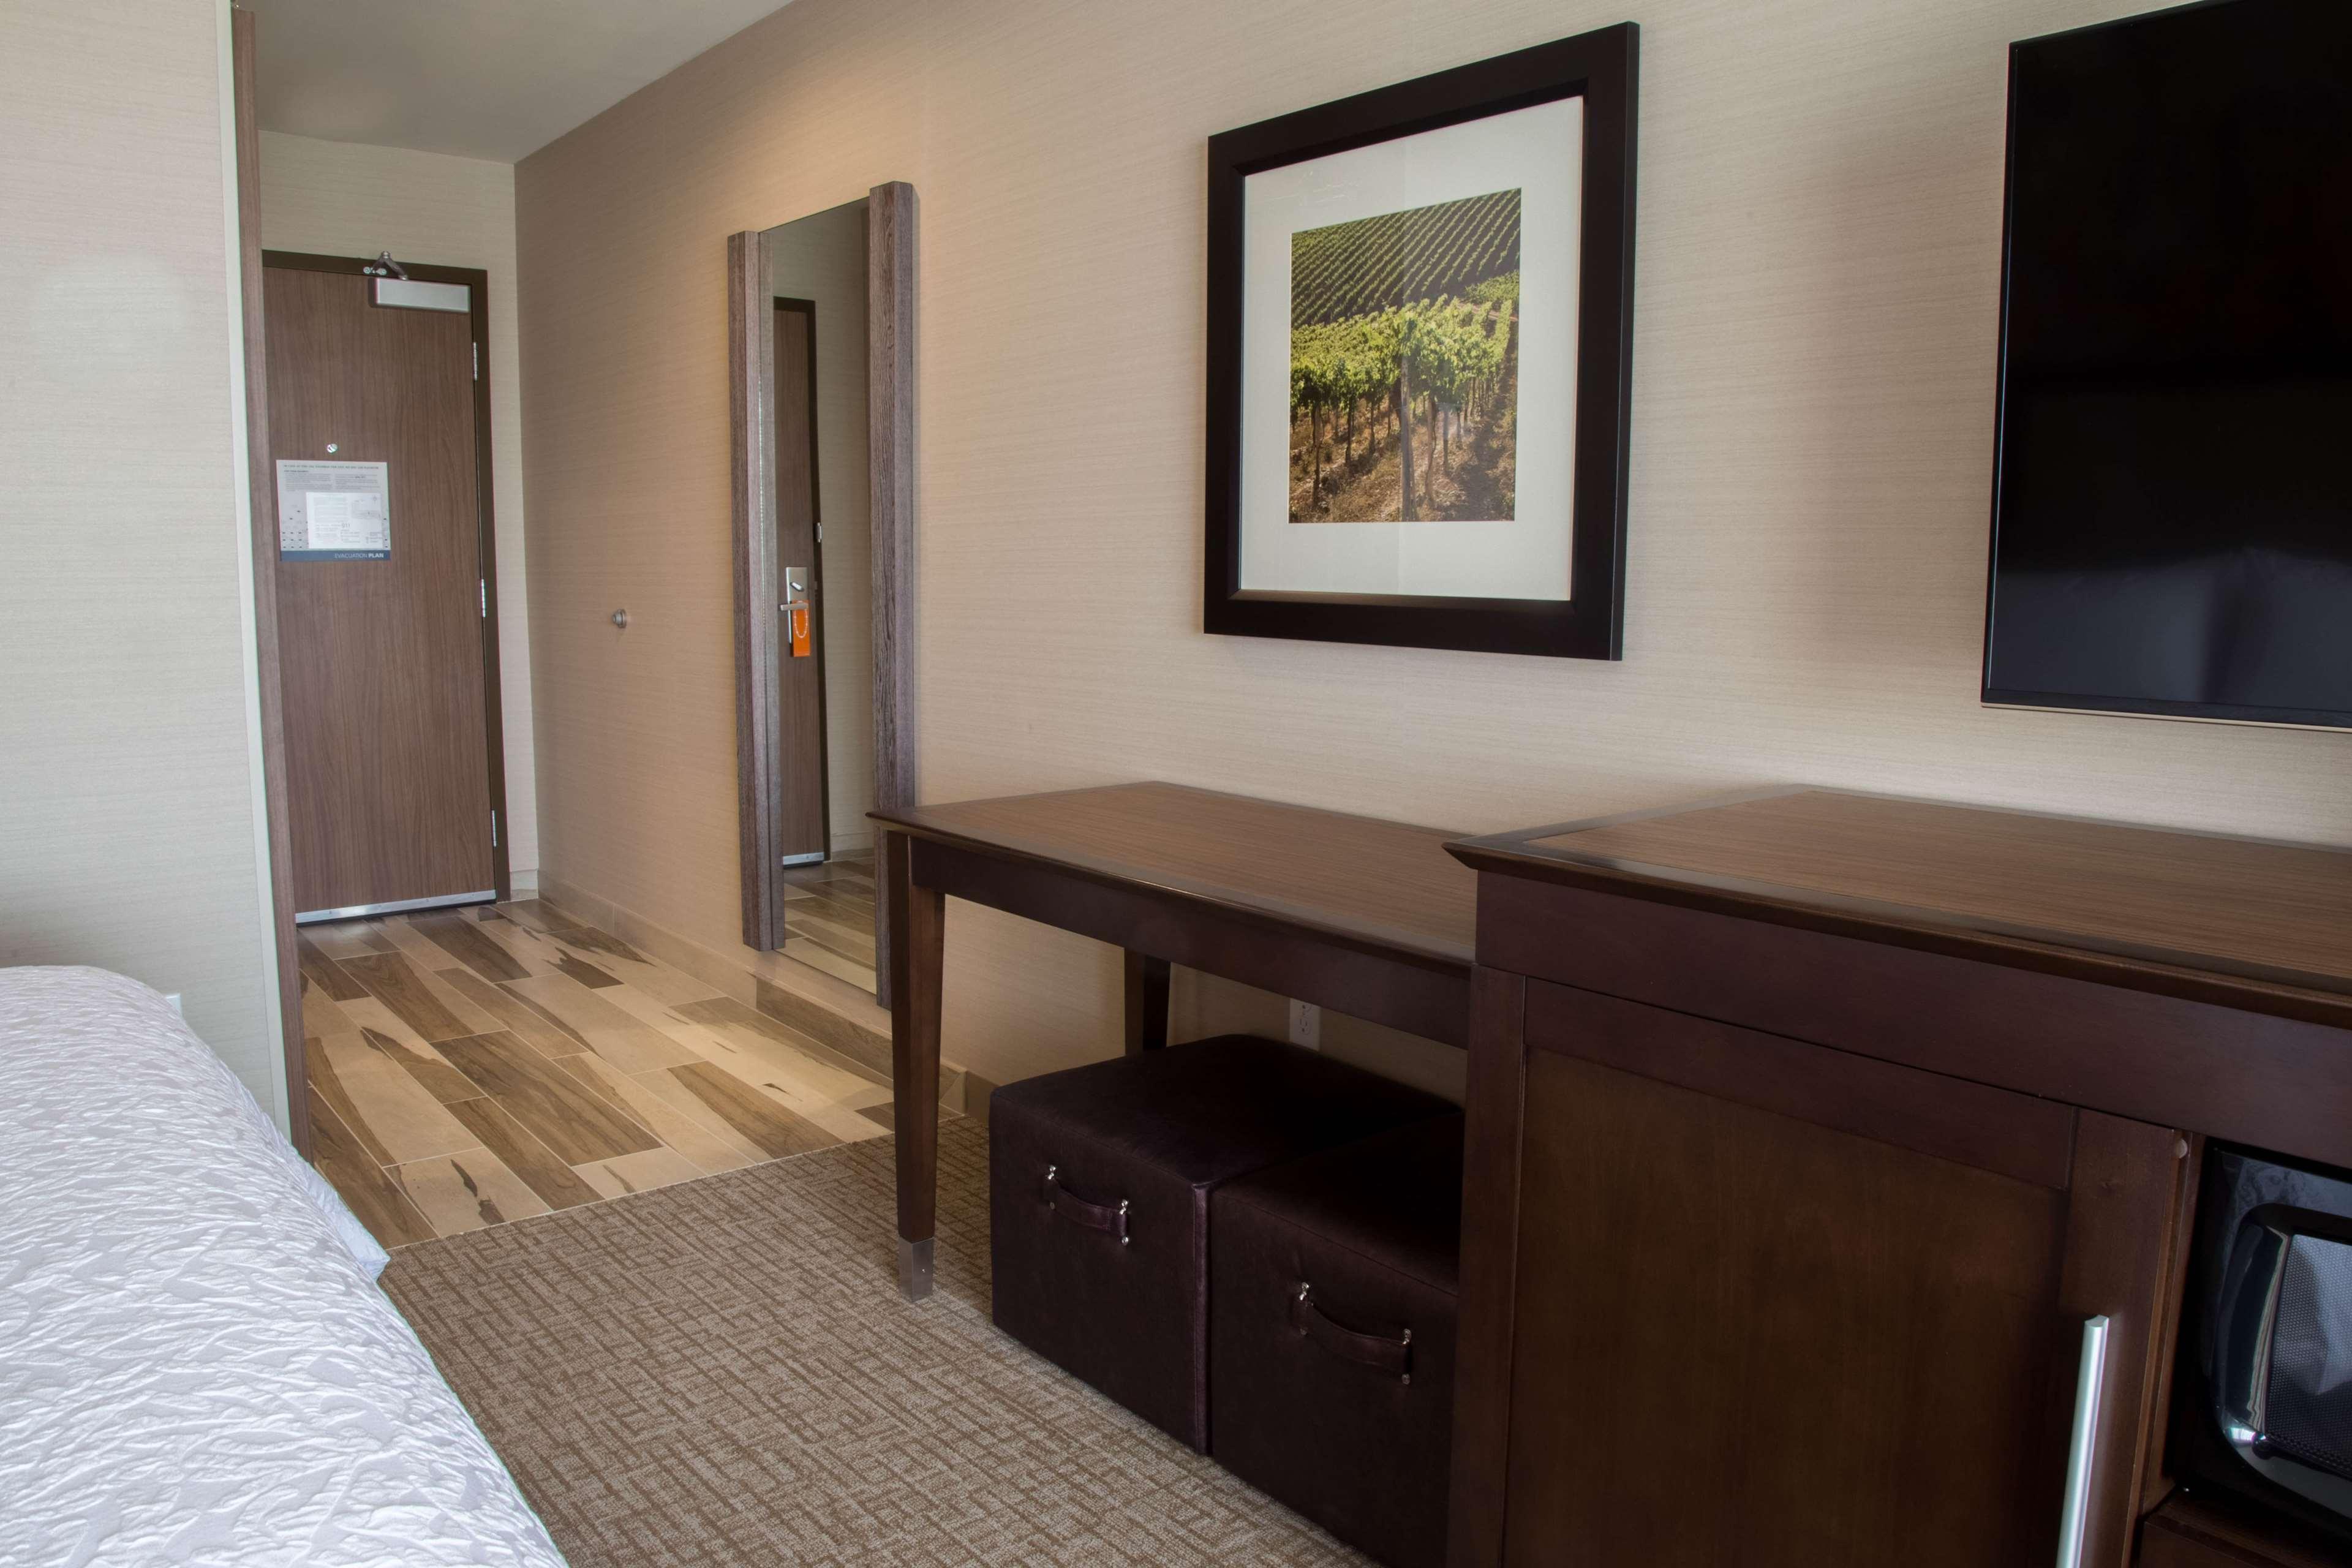 Hampton Inn & Suites Murrieta Temecula image 16